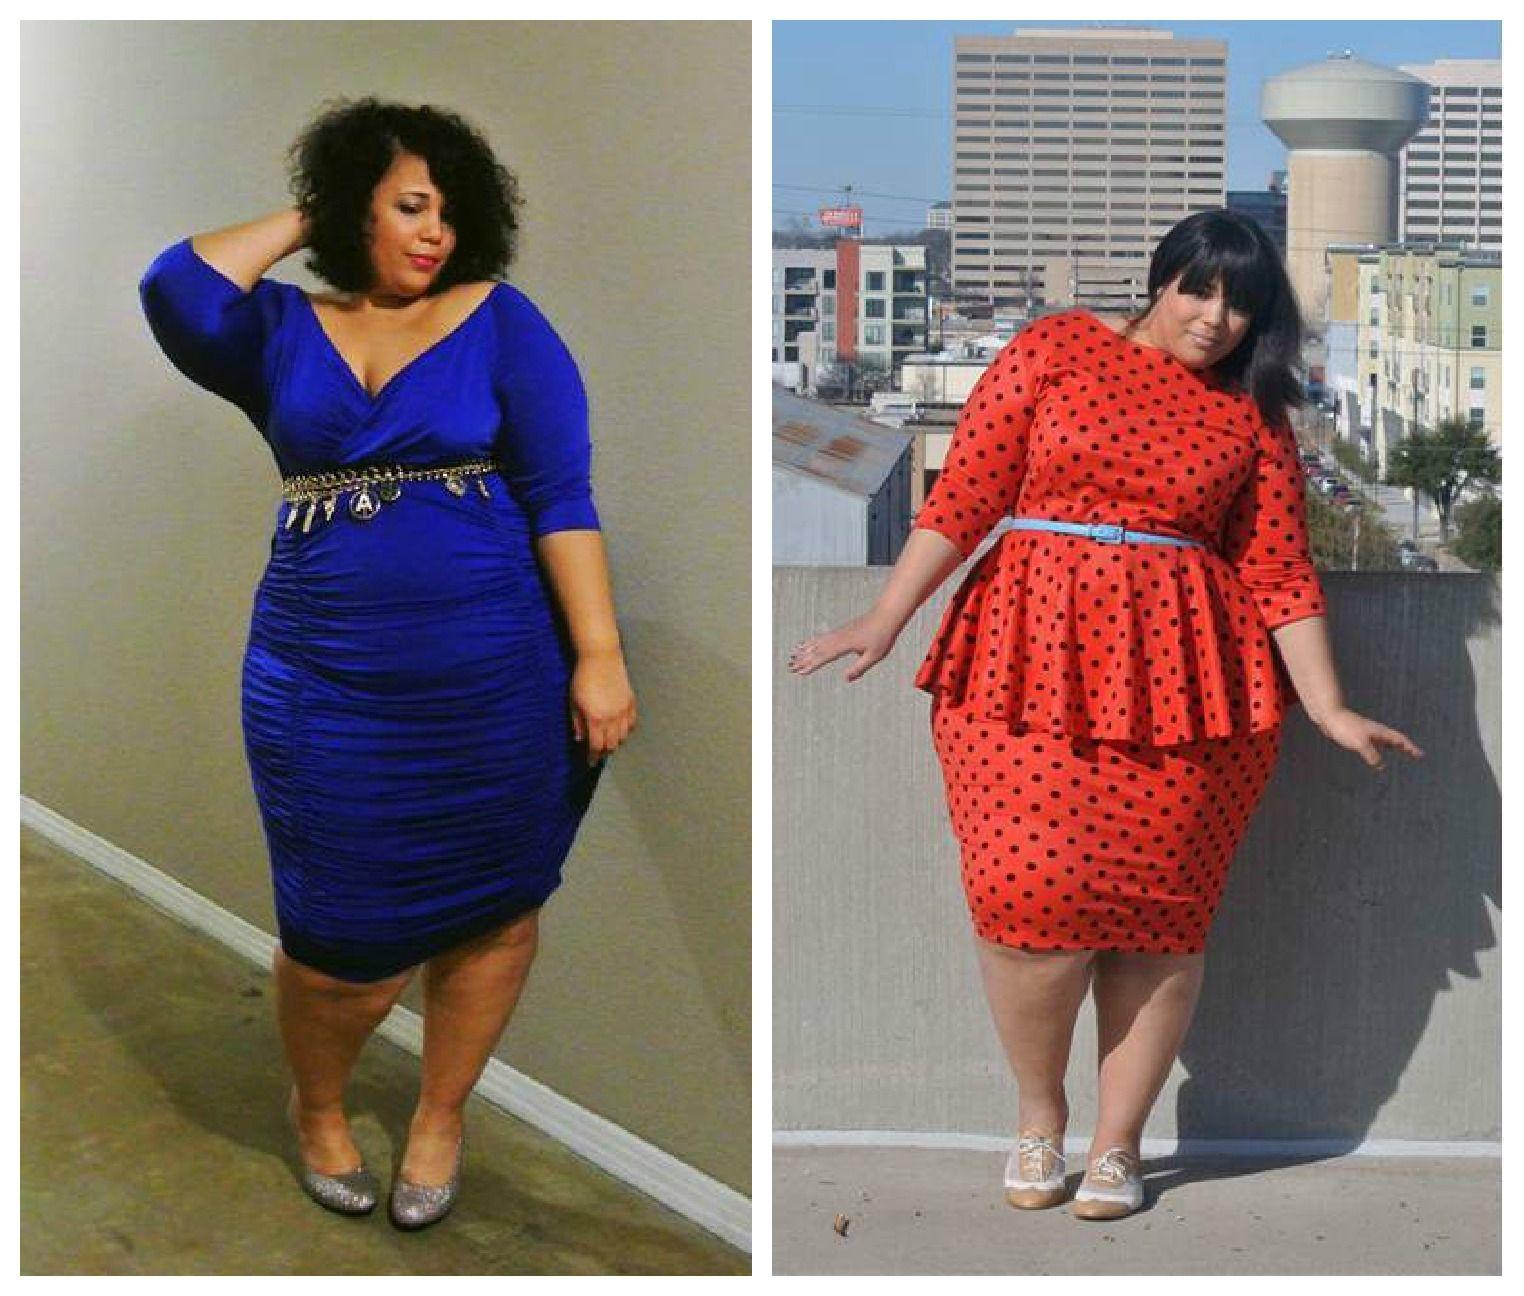 54a8c856b49 20 Plus Size Fashion Bloggers at Sizes US 24+